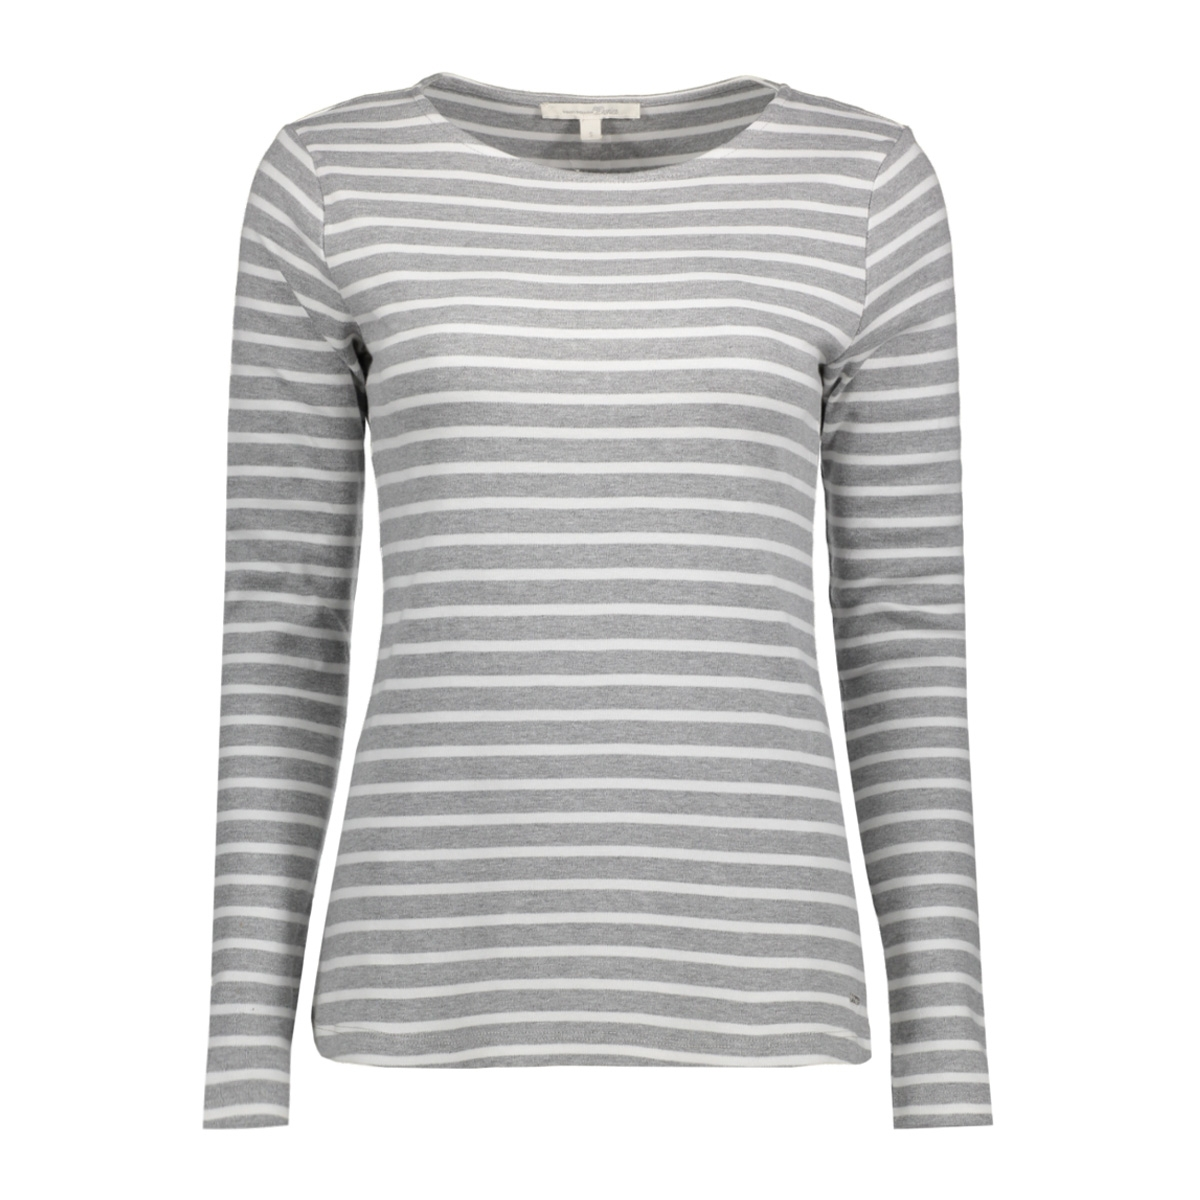 1035268.09.71 tom tailor t-shirt 2973